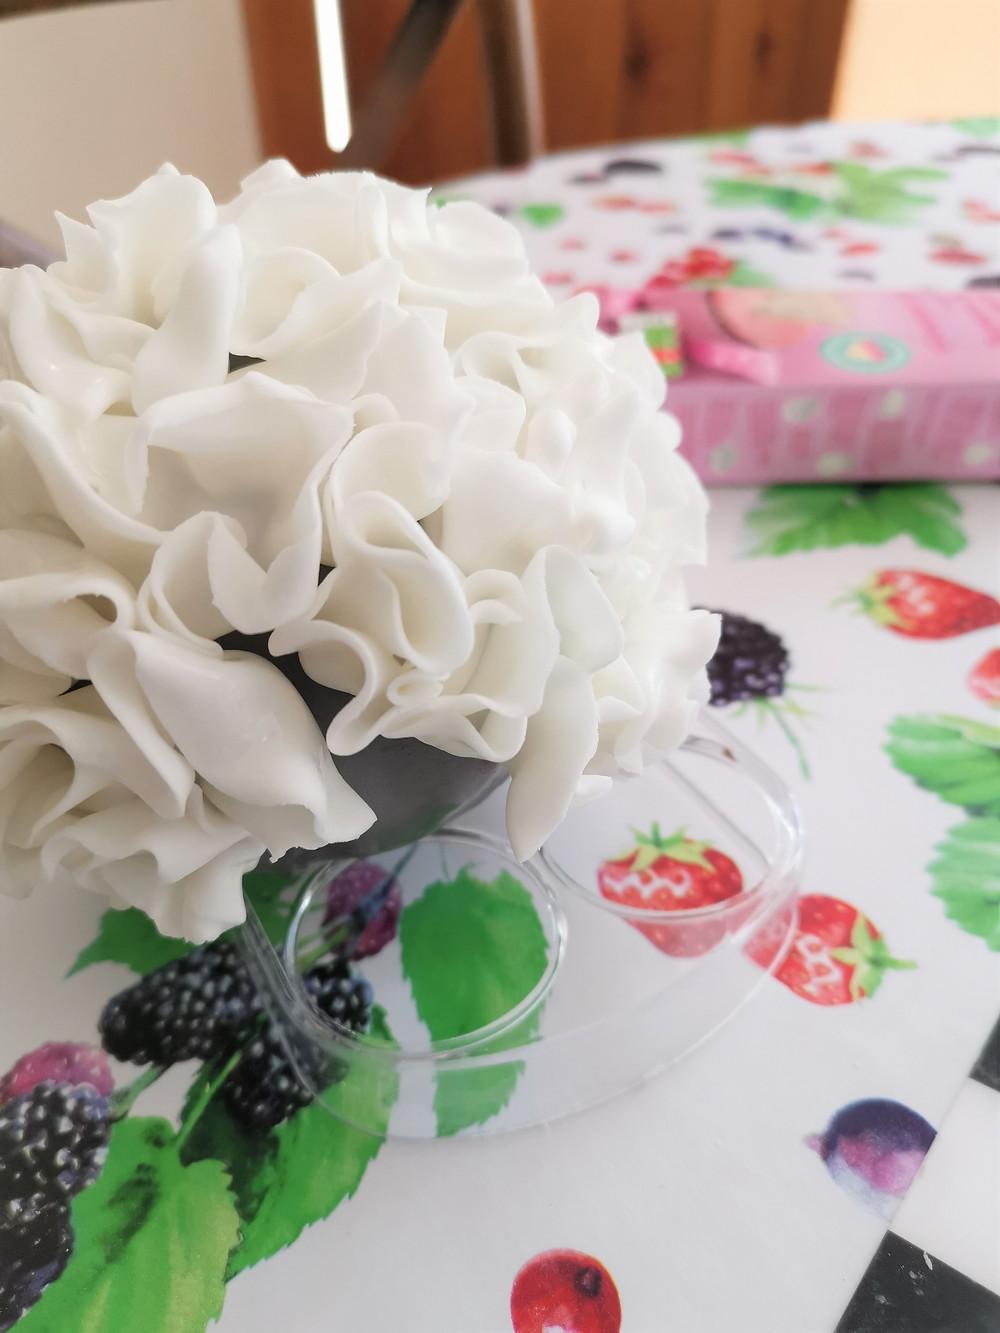 Gluten-free flower ball nearly finished